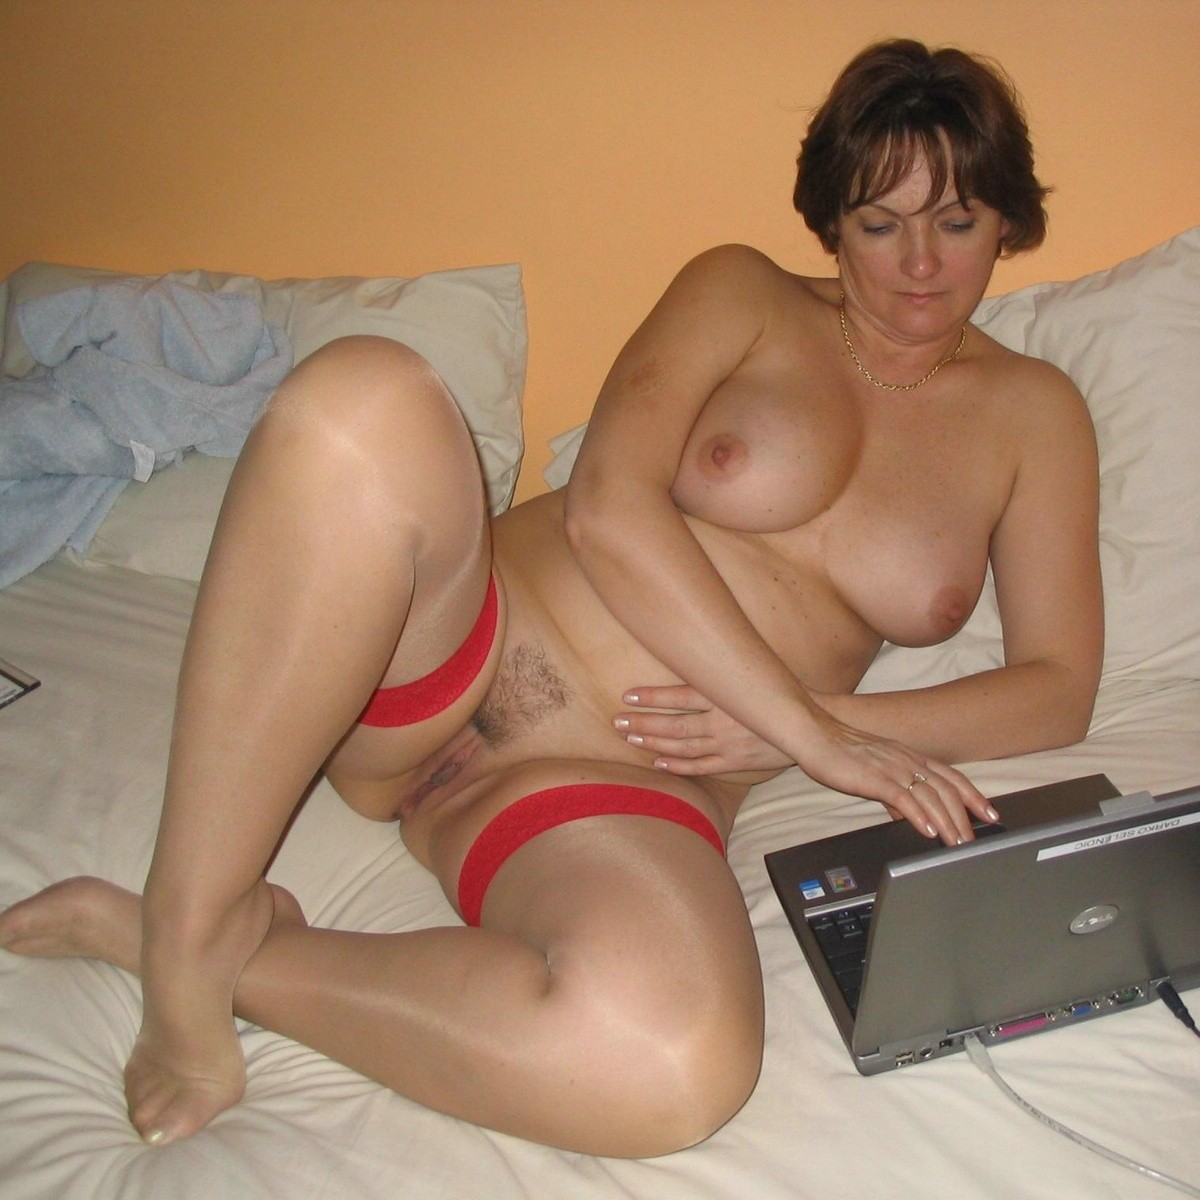 Hot russian gf sucks her boyfriend big cock perfectly 9